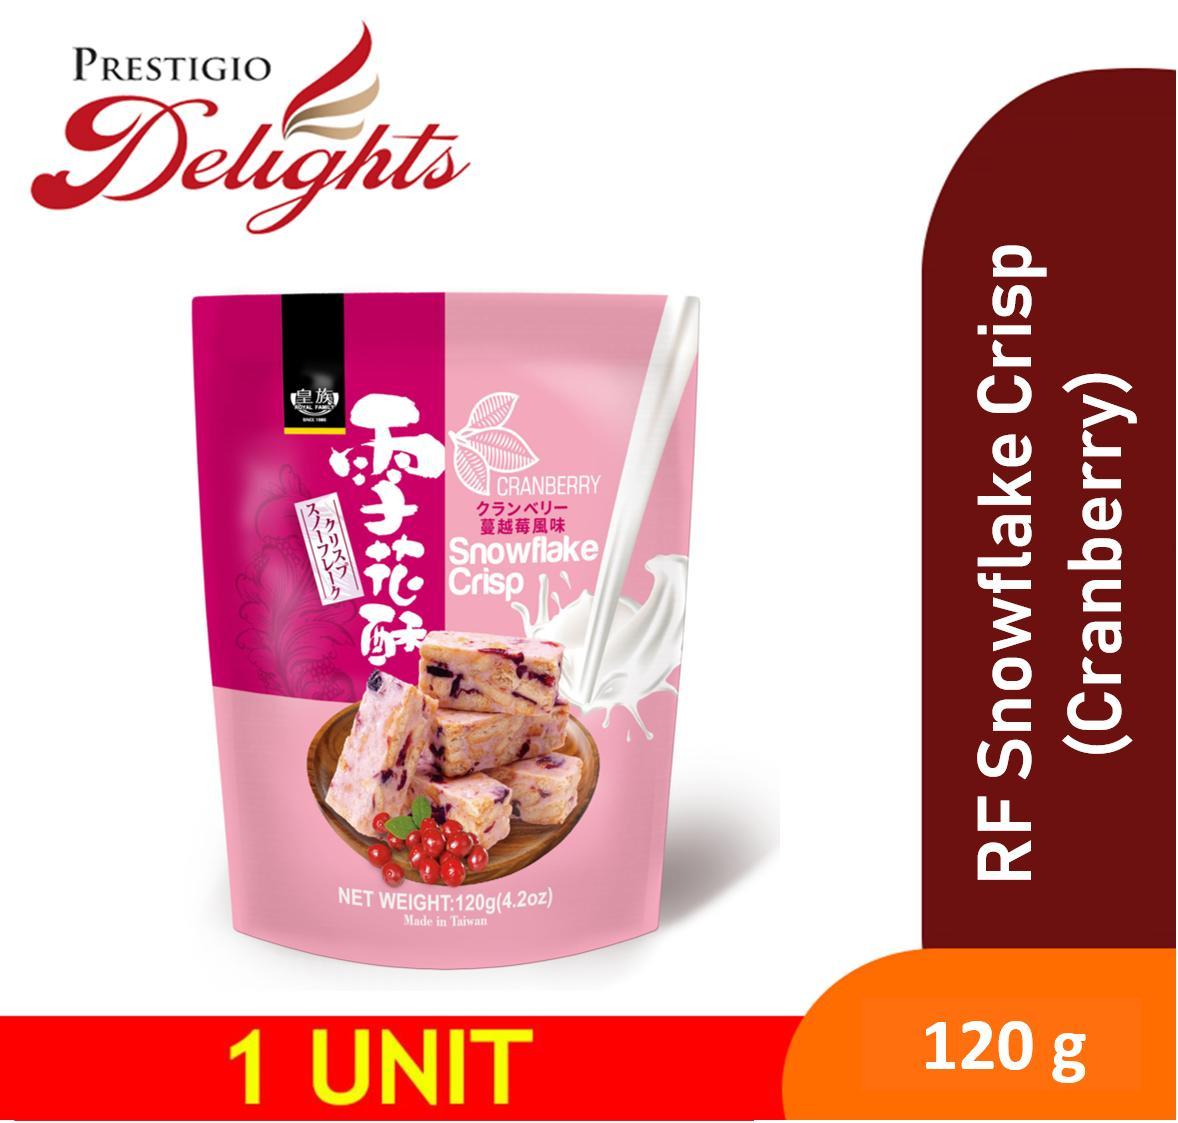 Royal Family Snowflake Crisp (cranberry) 120g 雪花酥-蔓越莓 By Prestigio Delights.